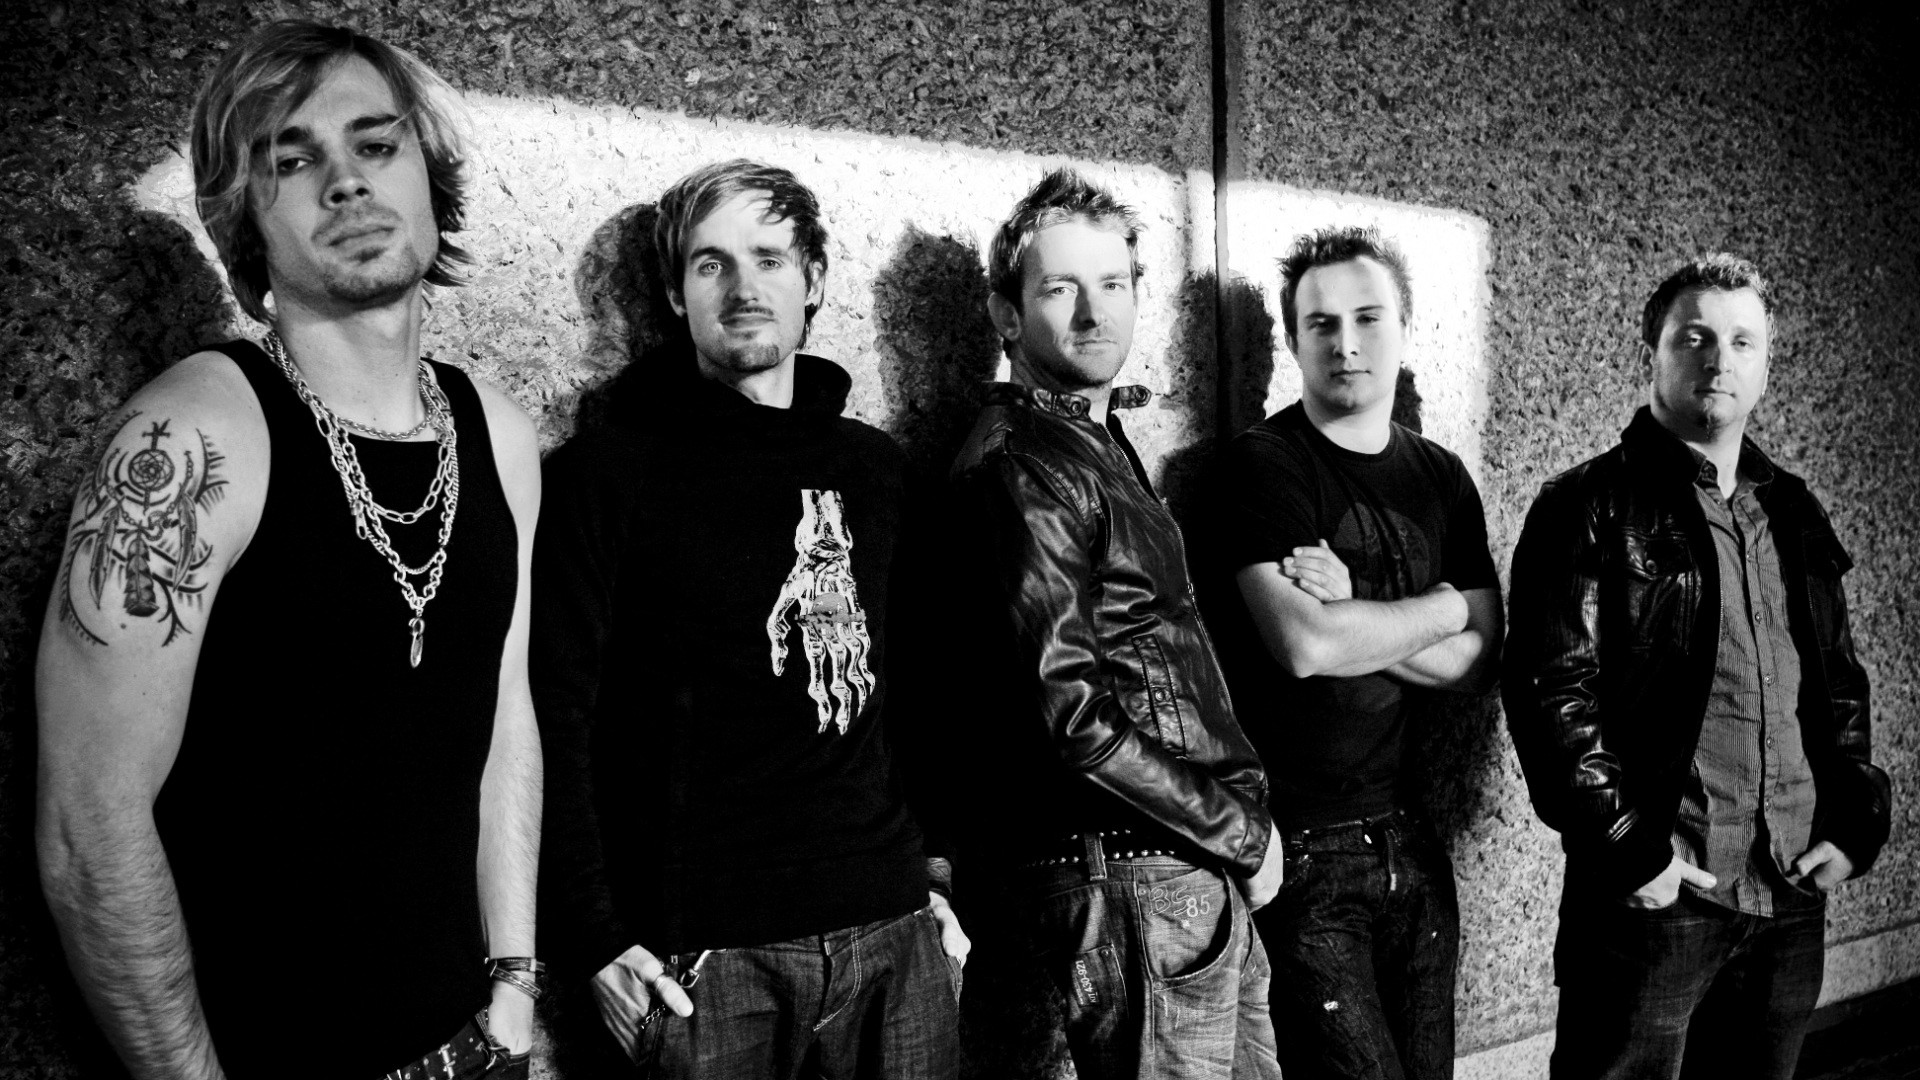 Fall Out Boy Wallpapers 2015 Slayer Band Wallpaper 183 ① Wallpapertag